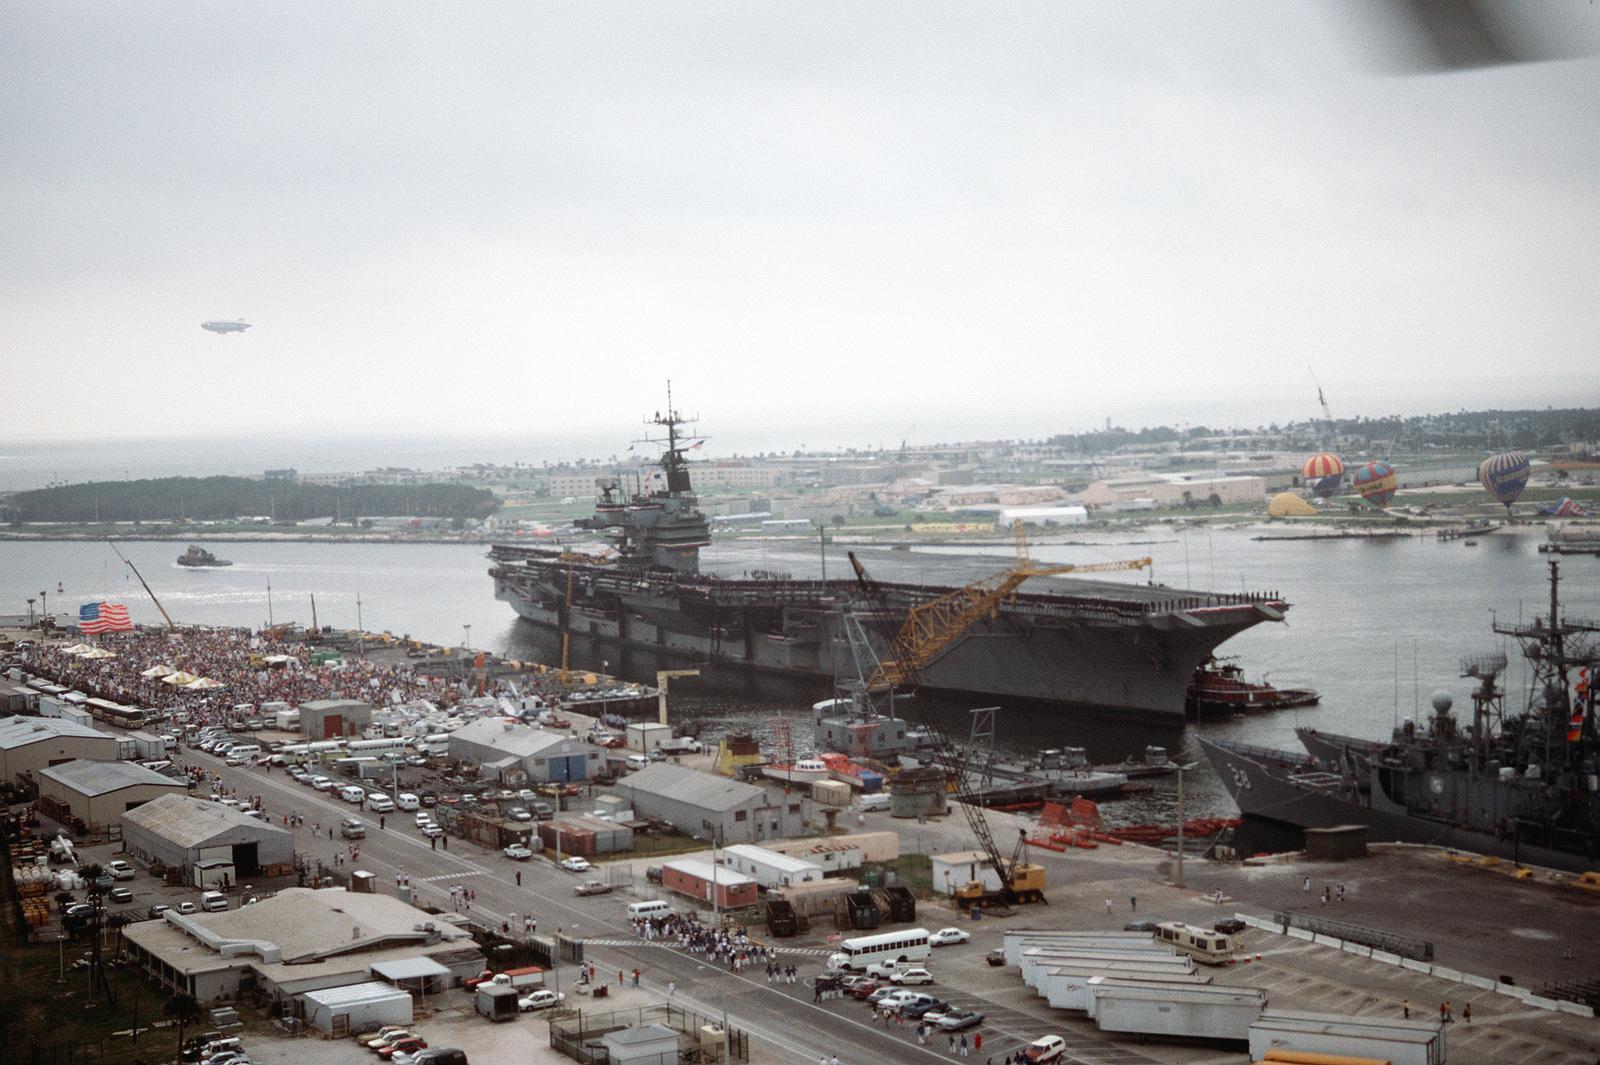 tug boats move the aircraft carrier uss saratoga cv 60 toward the